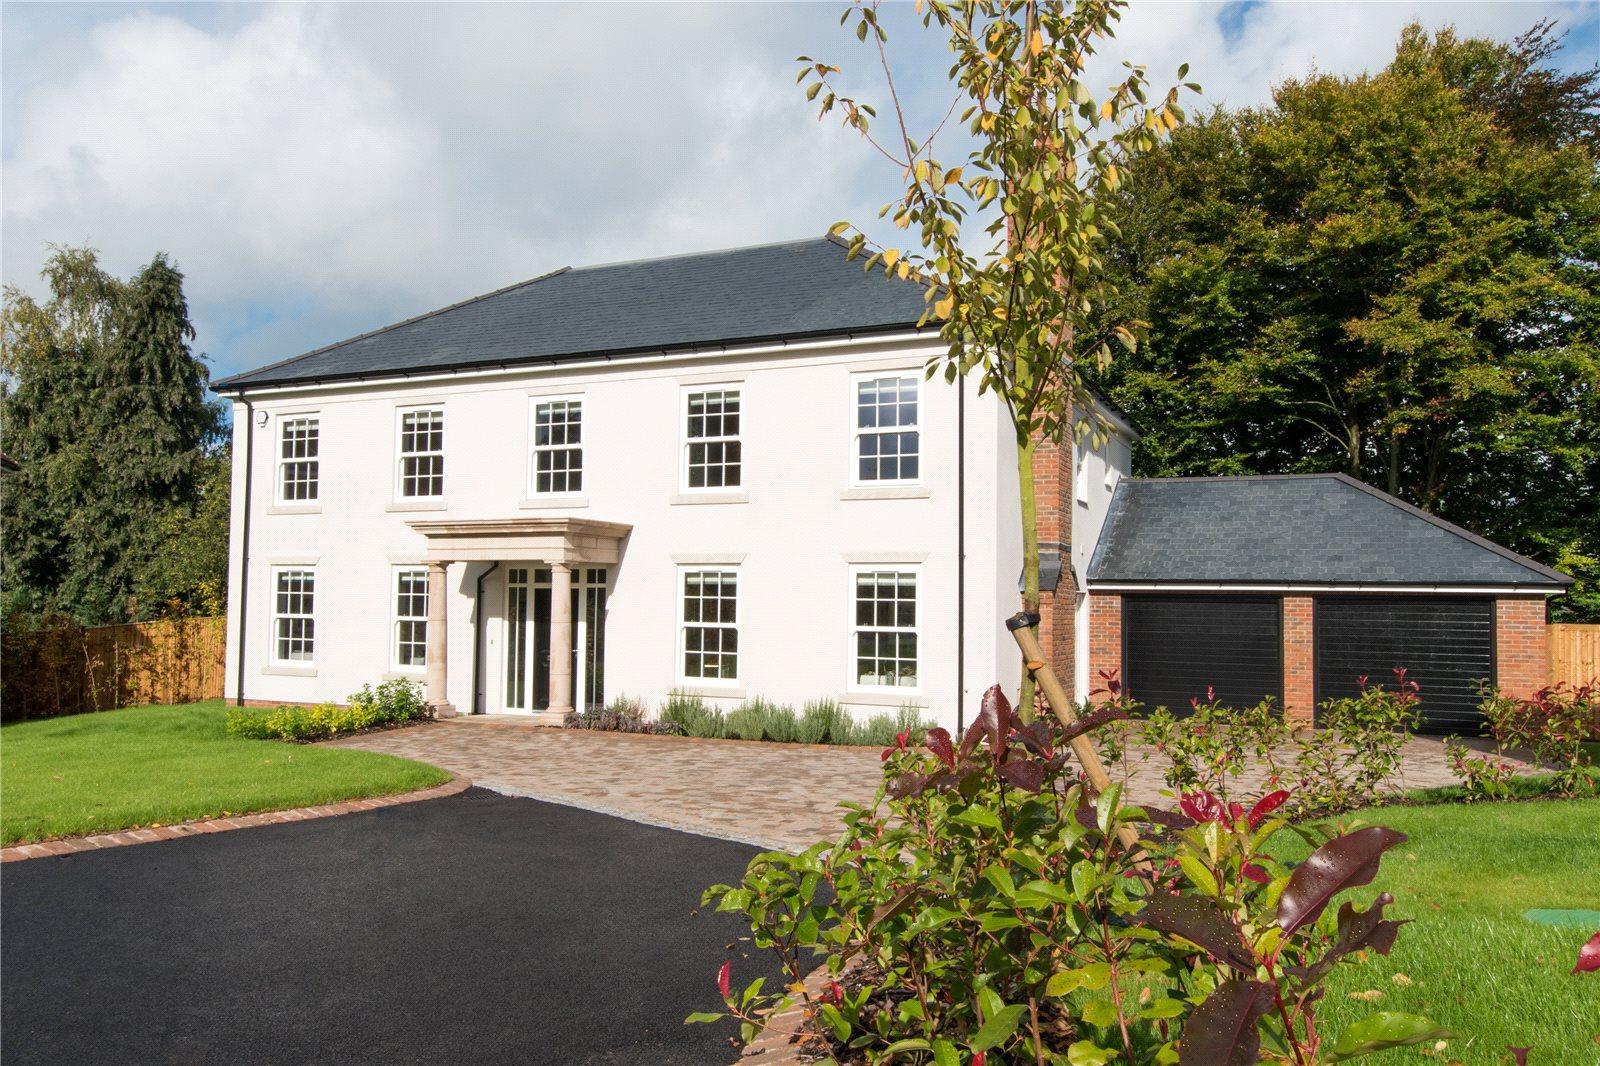 Single Family Home for Sale at Paddock Gardens, Crouch, Borough Green, Sevenoaks, TN15 Sevenoaks, England